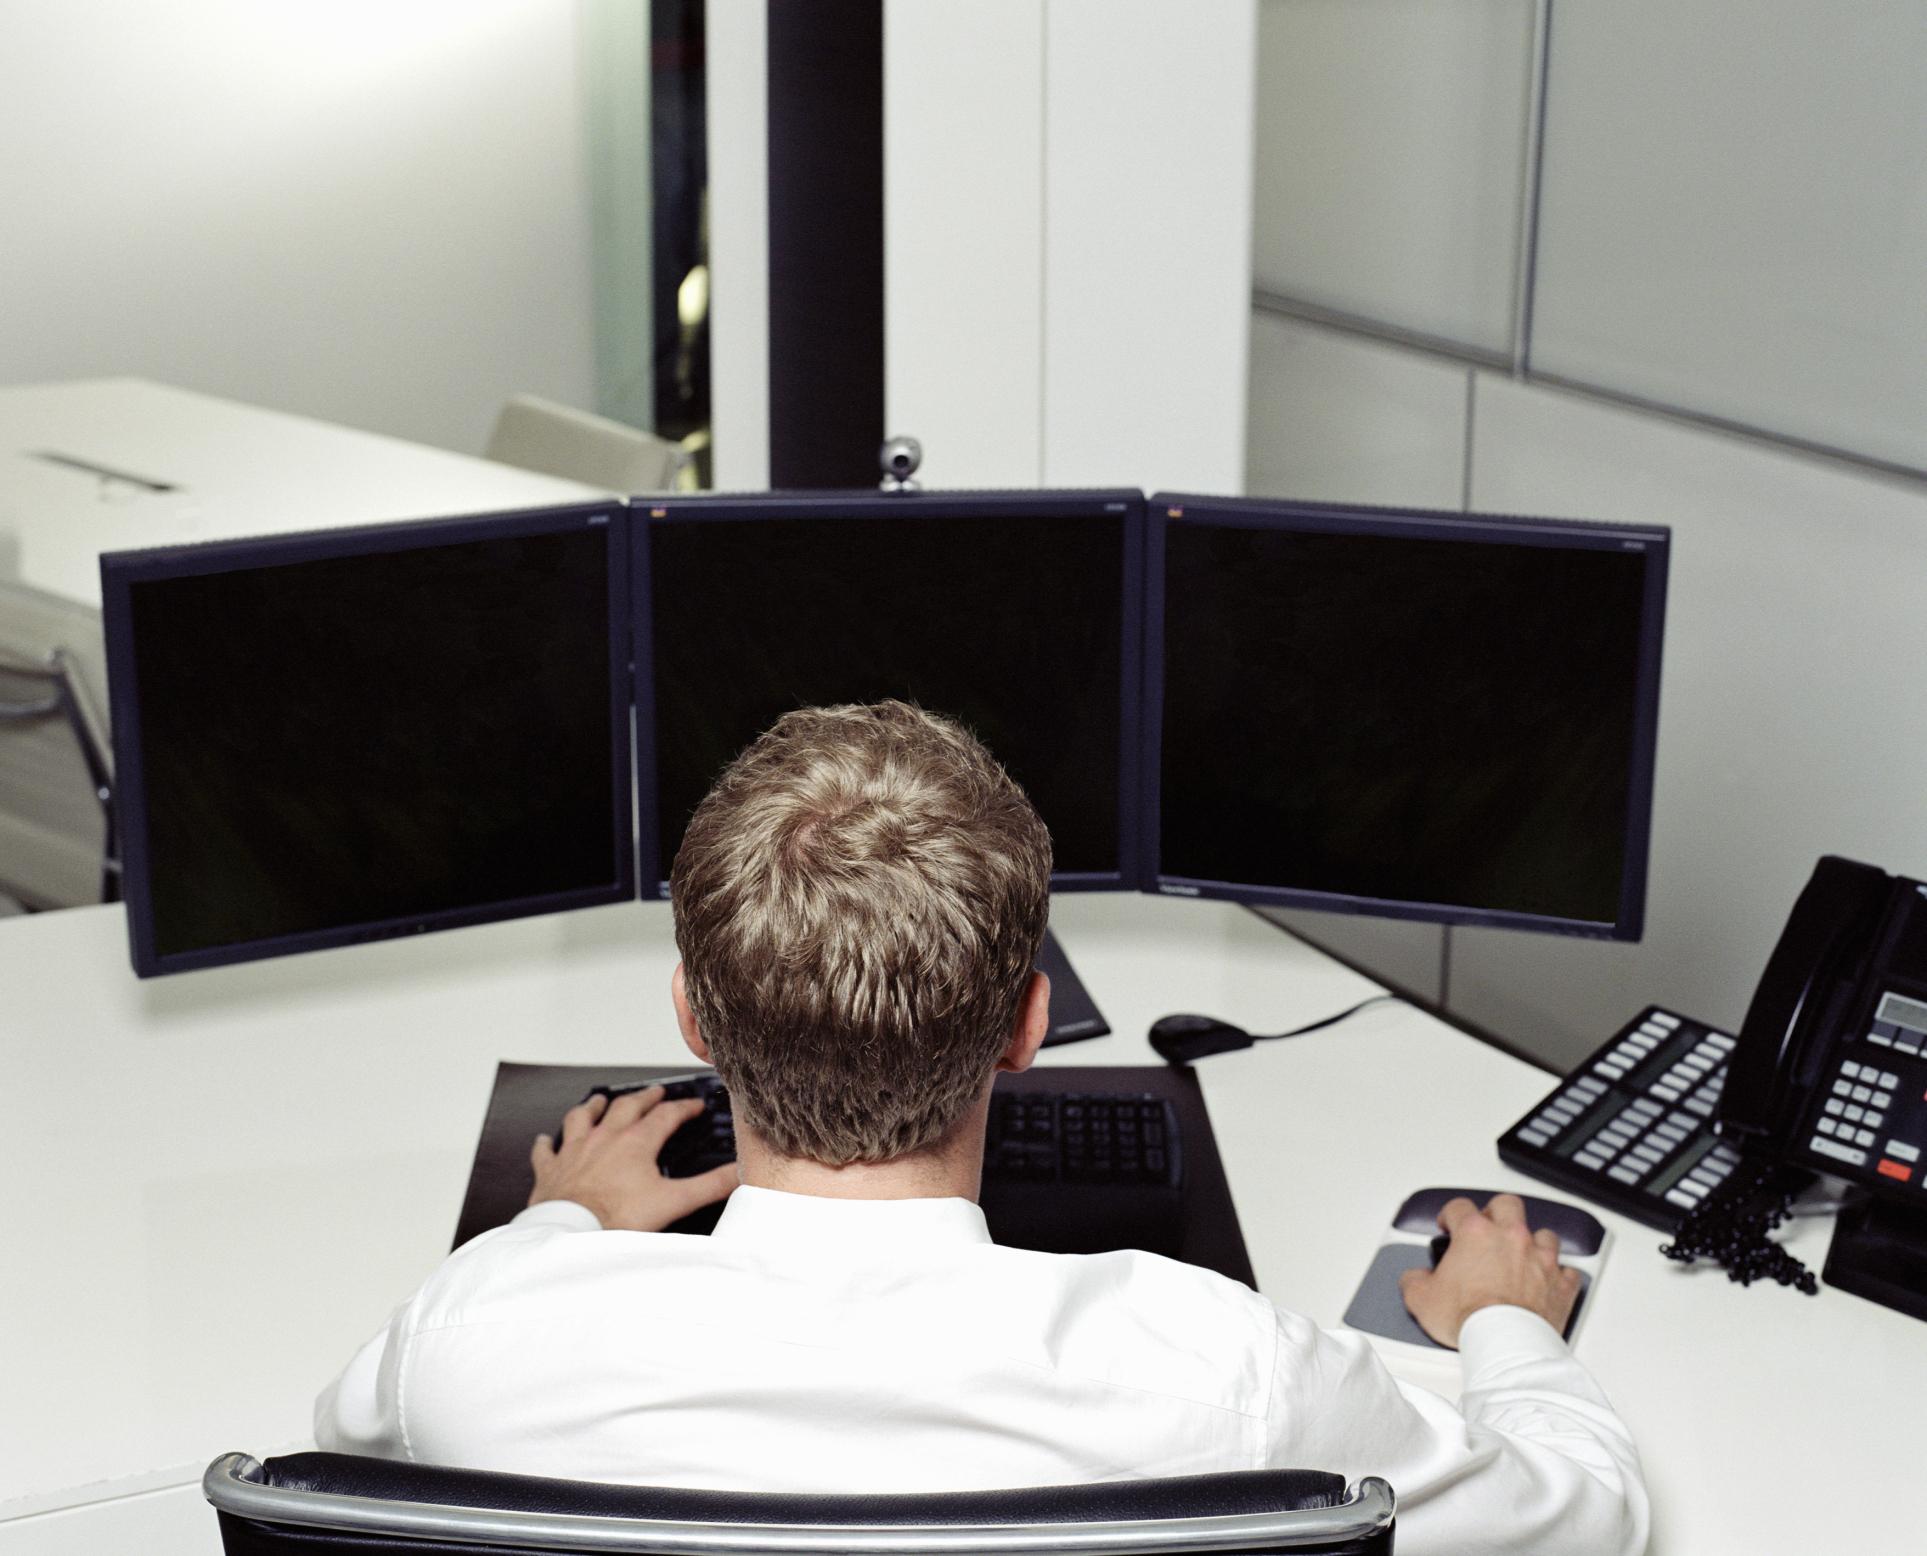 Do You Really Need Two Video Cards for a Dual Monitor Setup? | Chron com